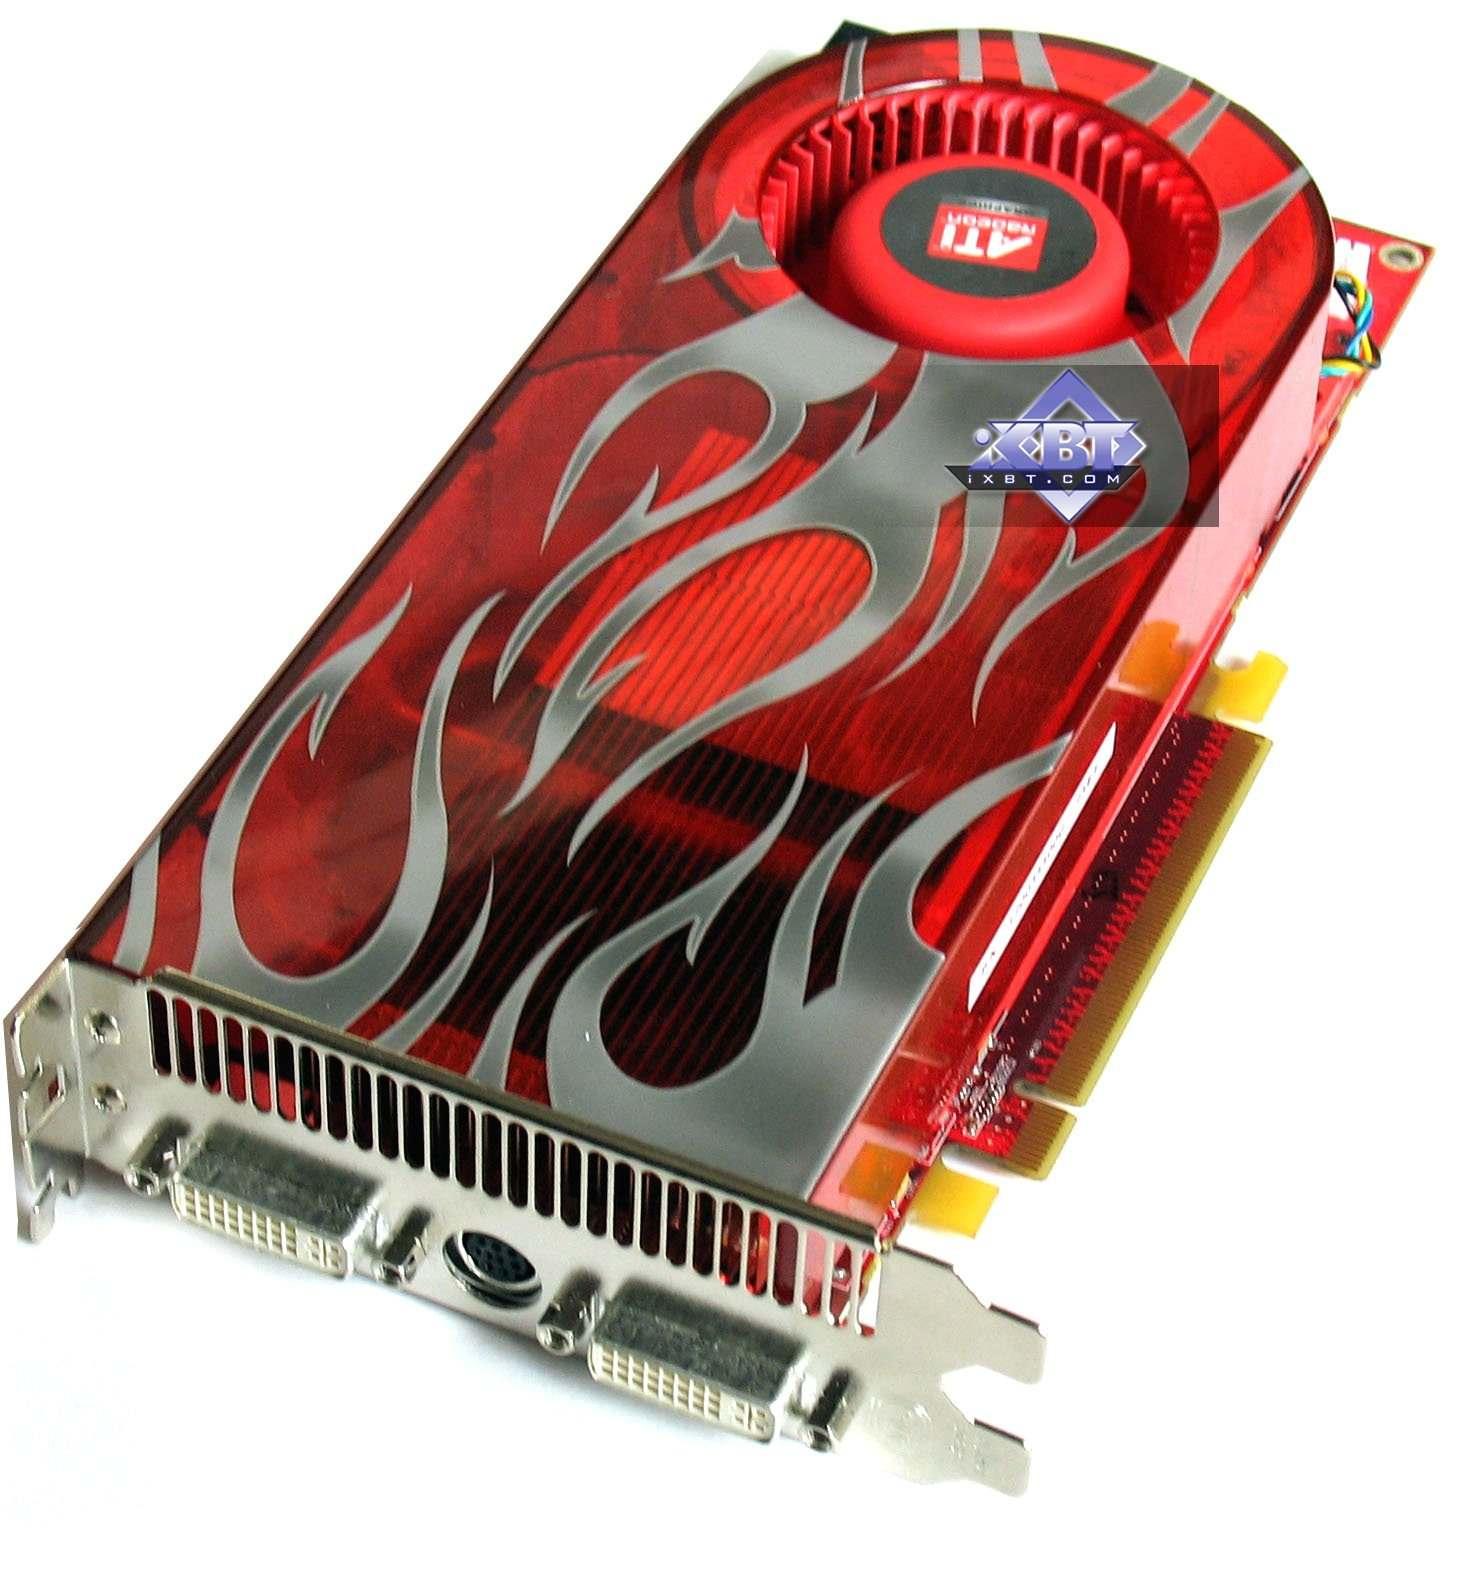 Radeon Hd 2900 Pro Драйвер